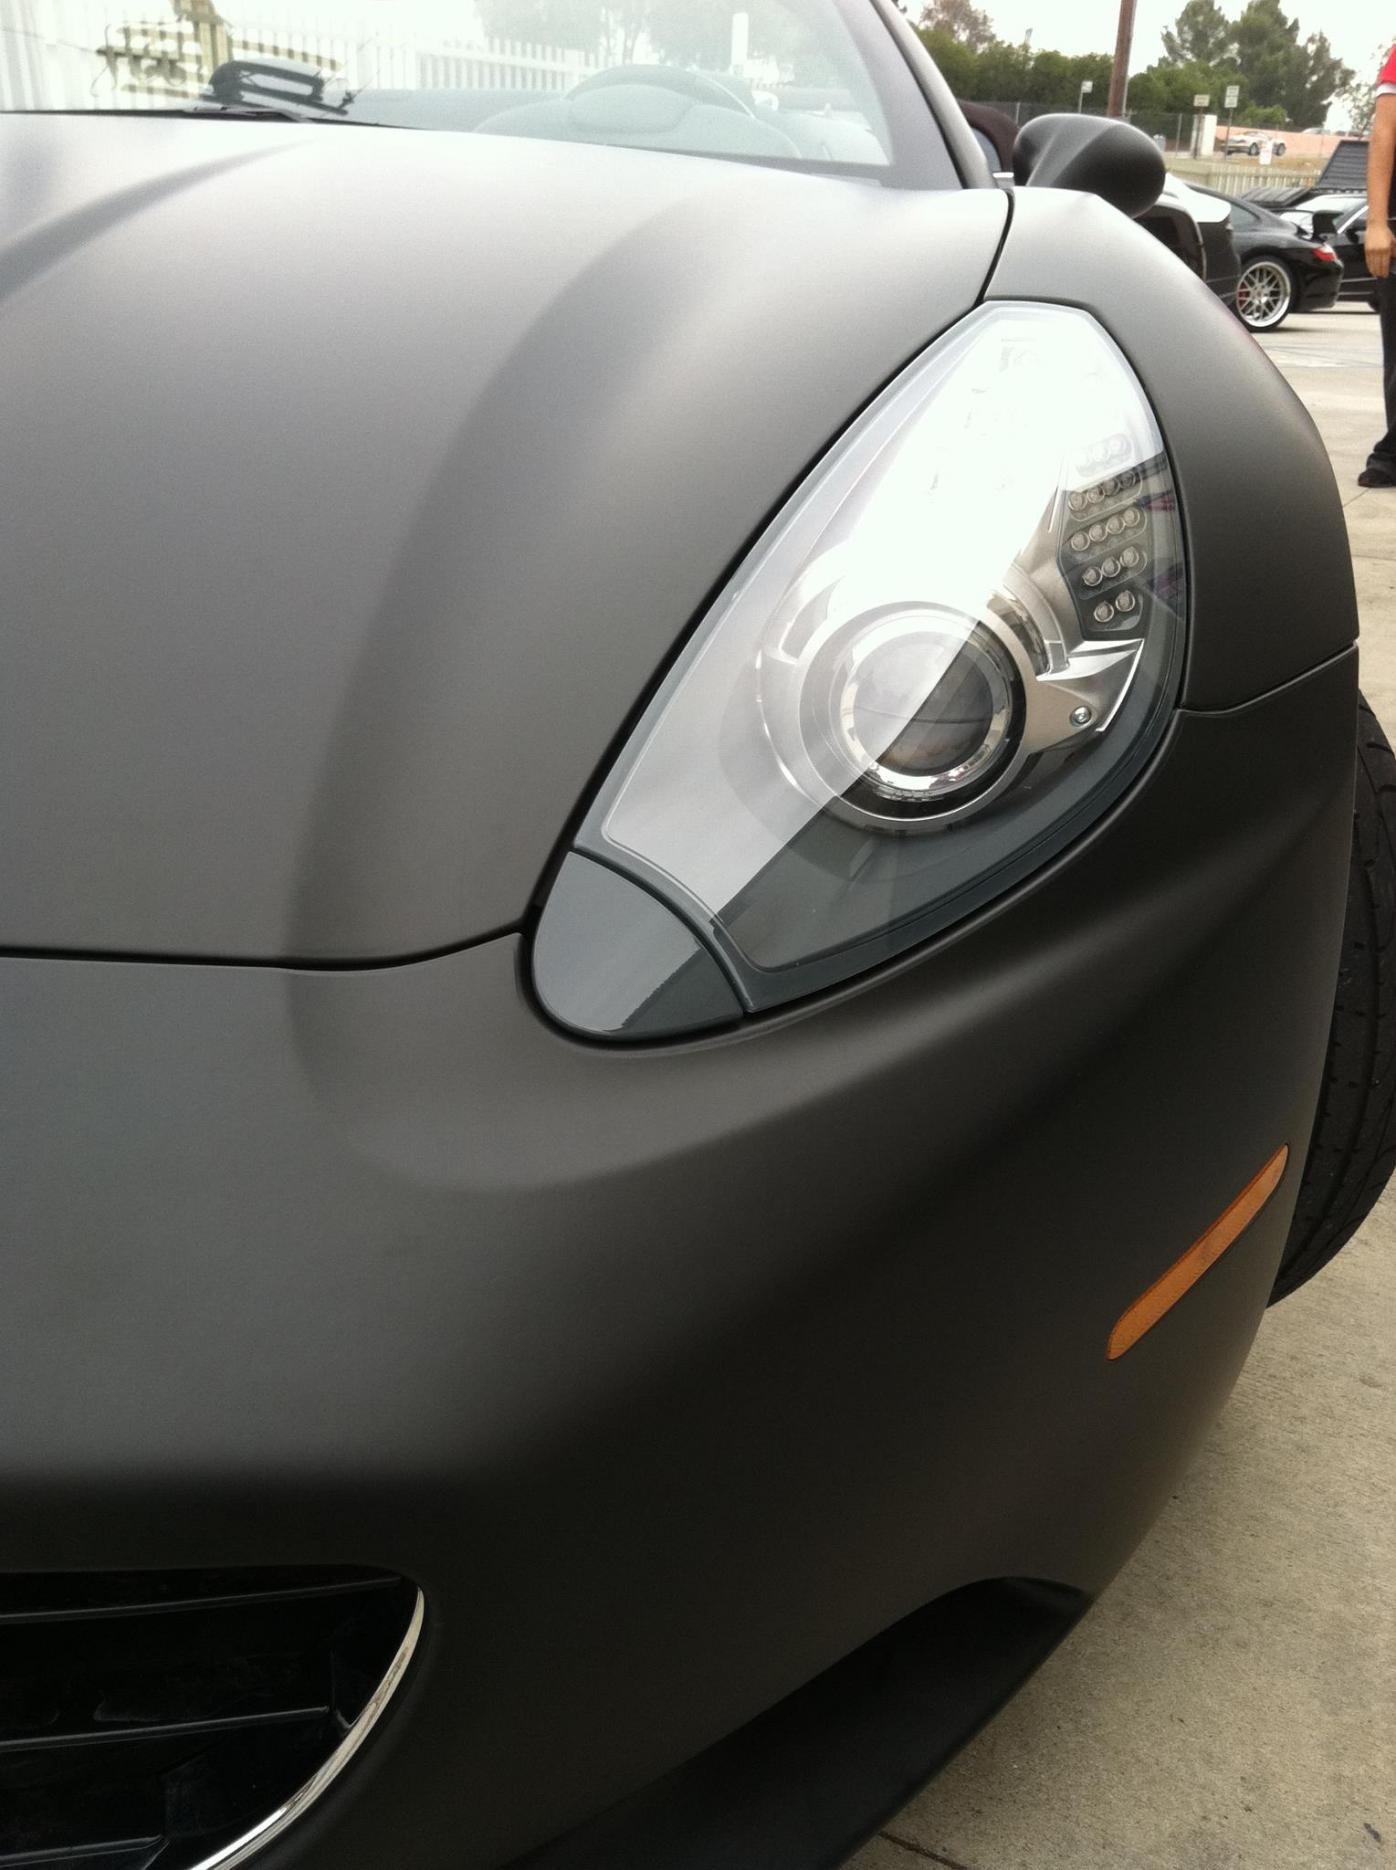 Vinyl Car Wrap Worth Doing Moneysavingexpert Com Forums